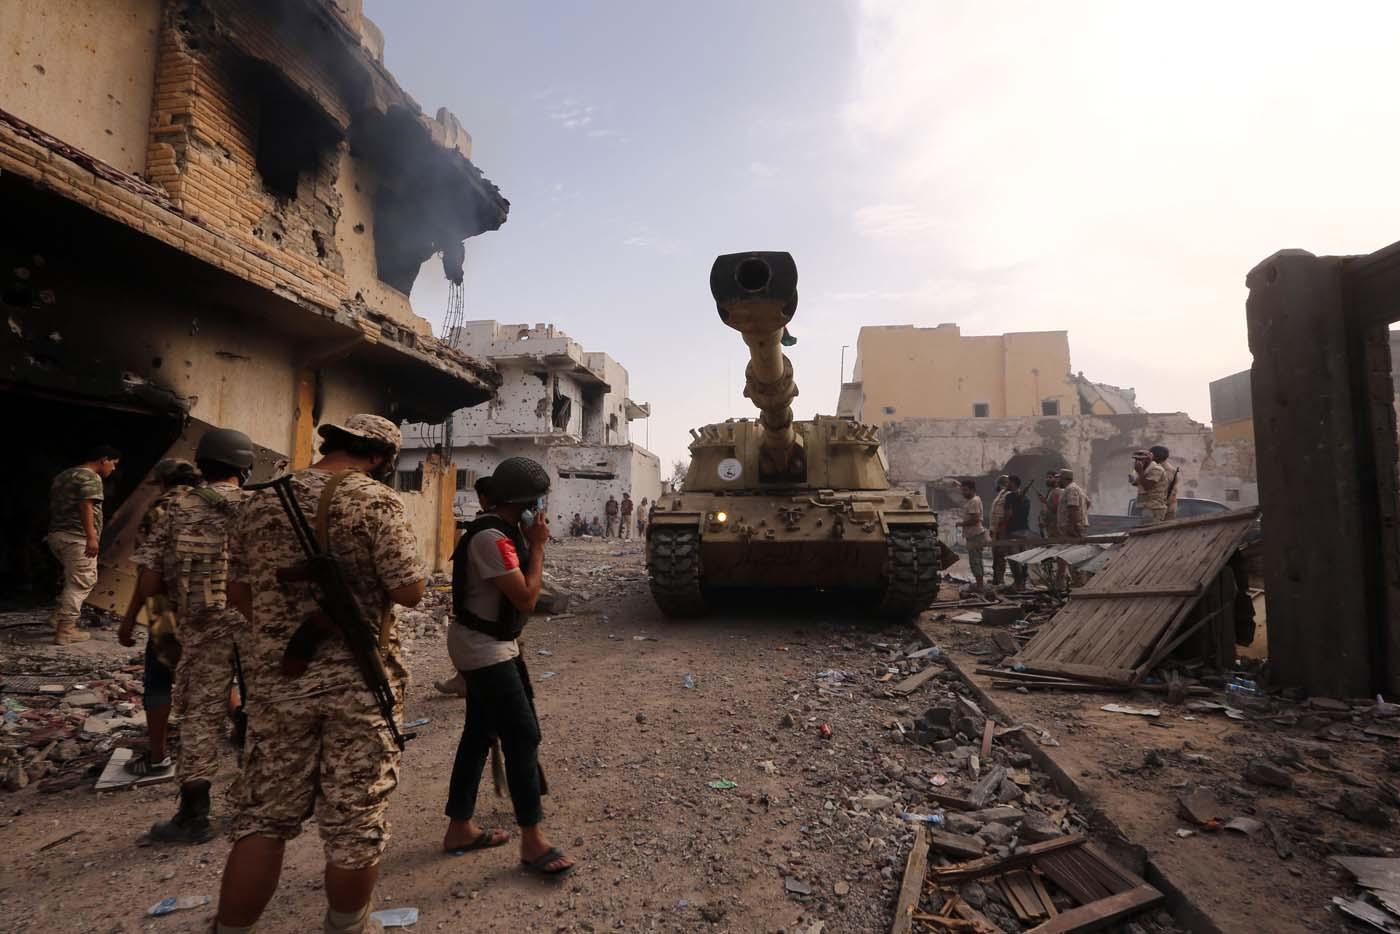 Bombardeo en Libia / Imagen referencial / Reuters